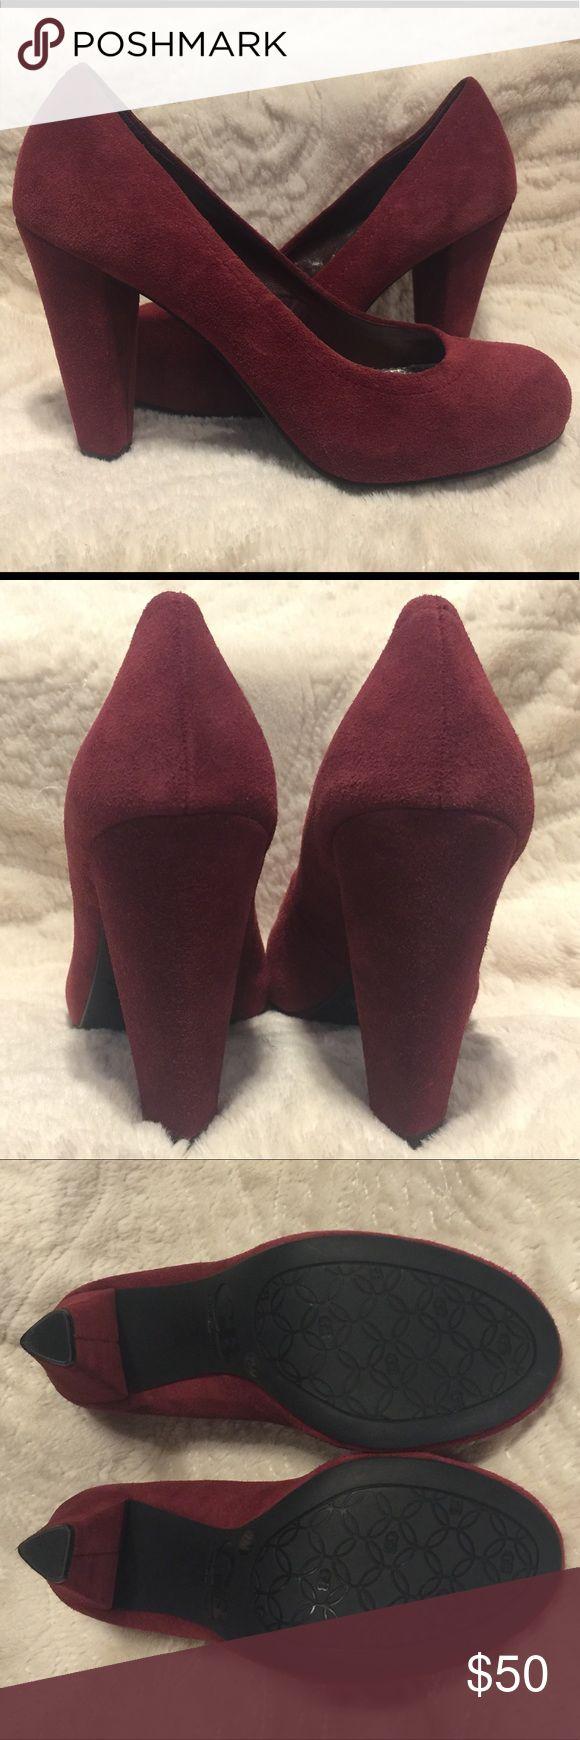 Gianni Bini Burgundy Suede Pump NEW Gianni Bini Burgundy Suede Pump. Never worn. Perfect condition! Gianni Bini Shoes Heels